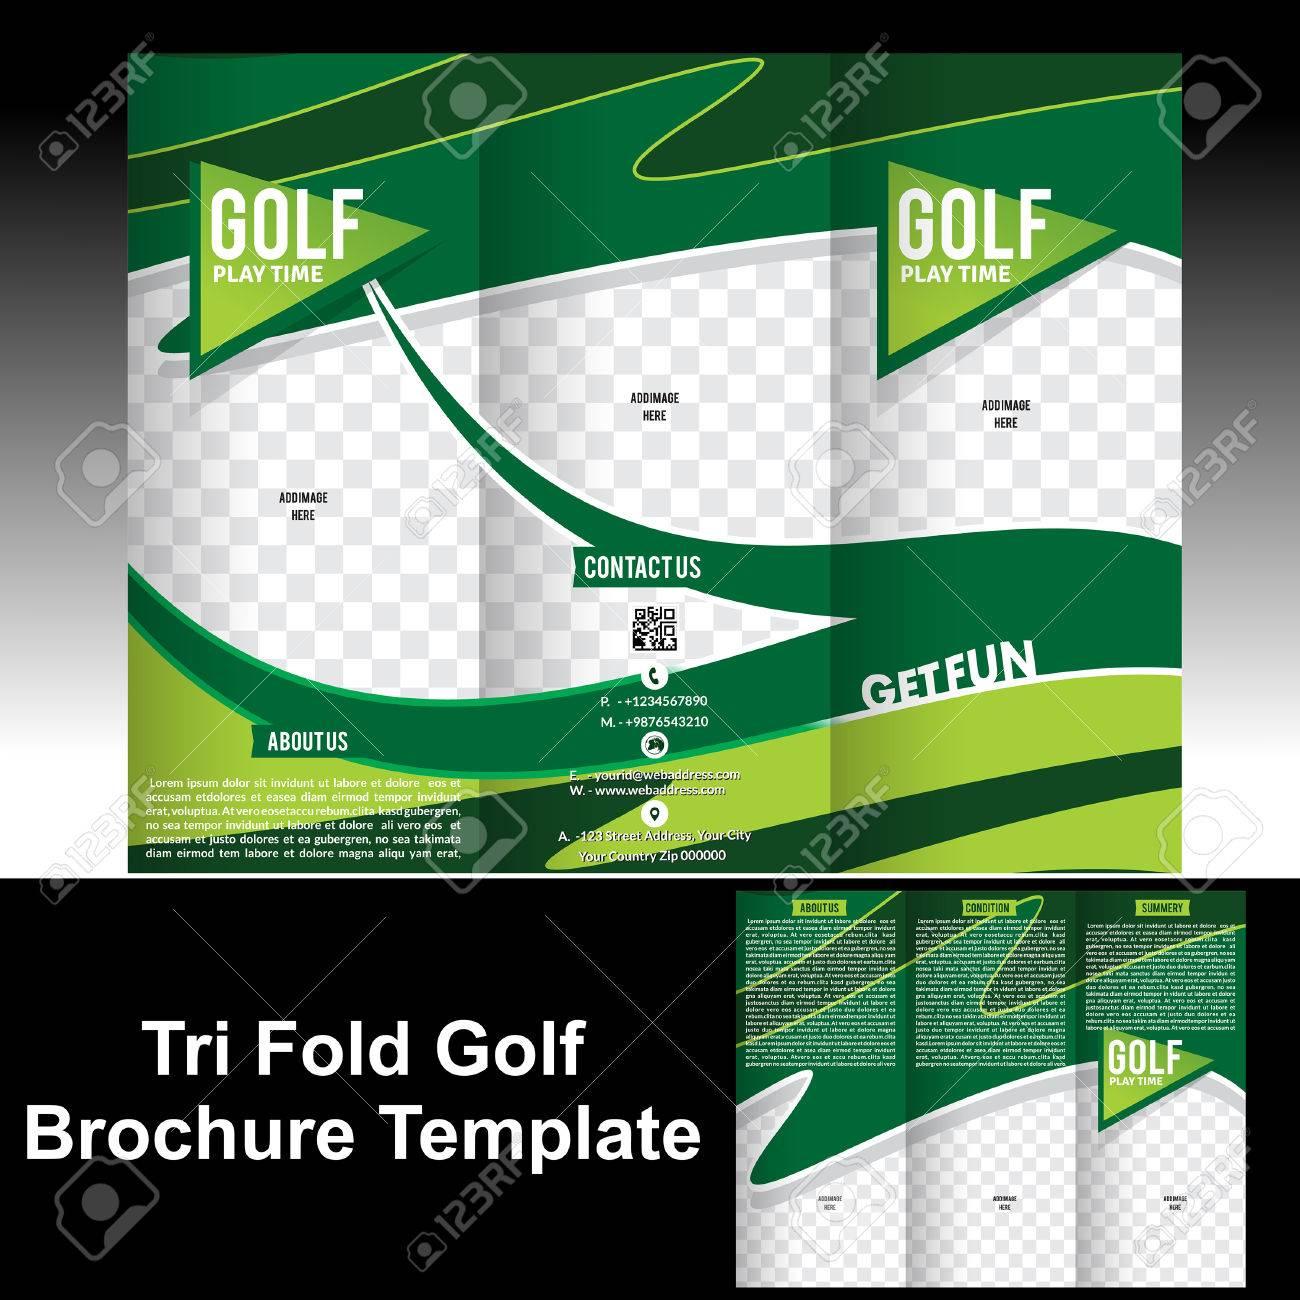 tri fold golf brochure template vector illustration stock vector 31875845